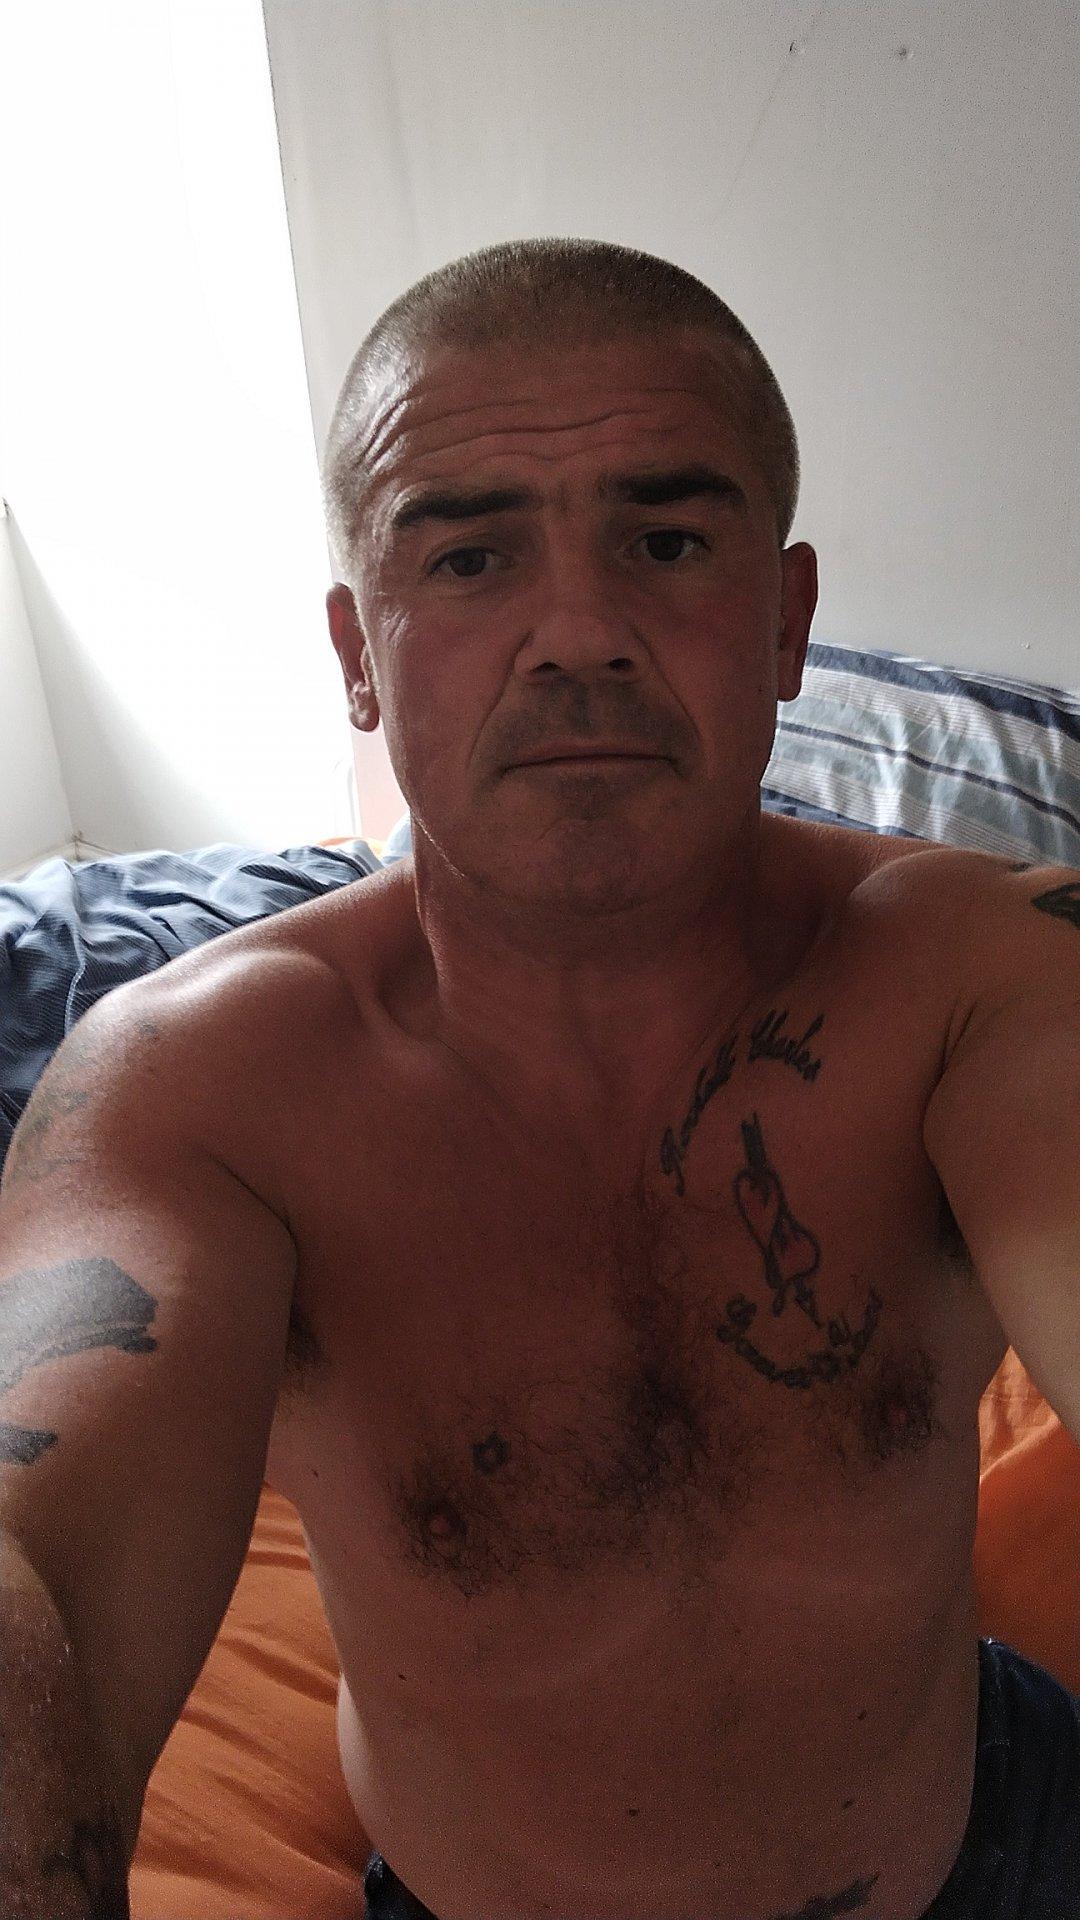 Karl4goodsex from Cardiff,United Kingdom